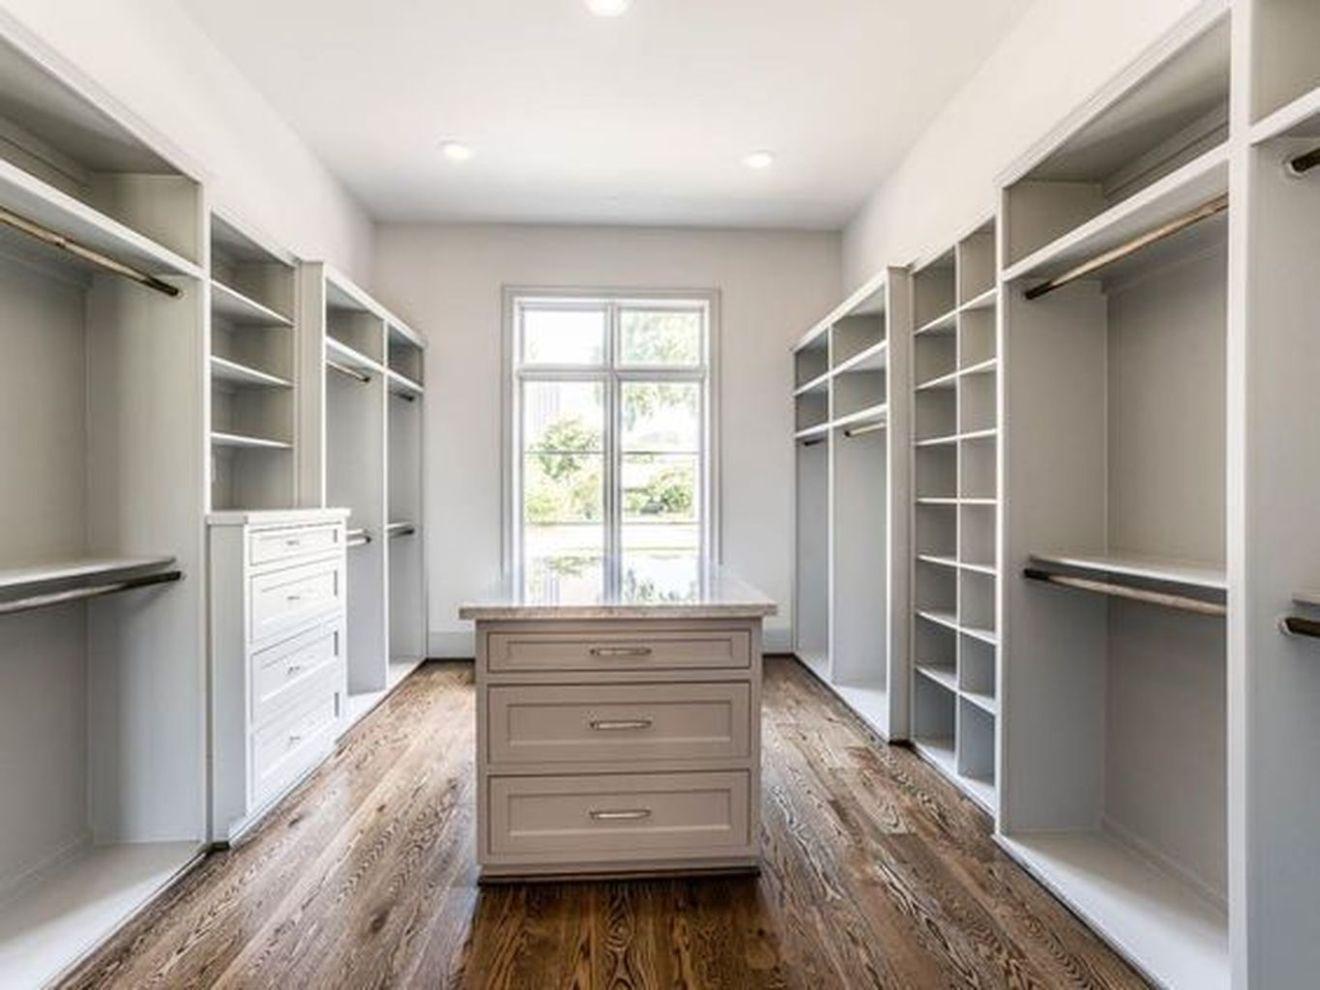 30 Interesting Walk In Closet With Window 23 Master Closet Design Bedroom Closet Design Closet Remodel